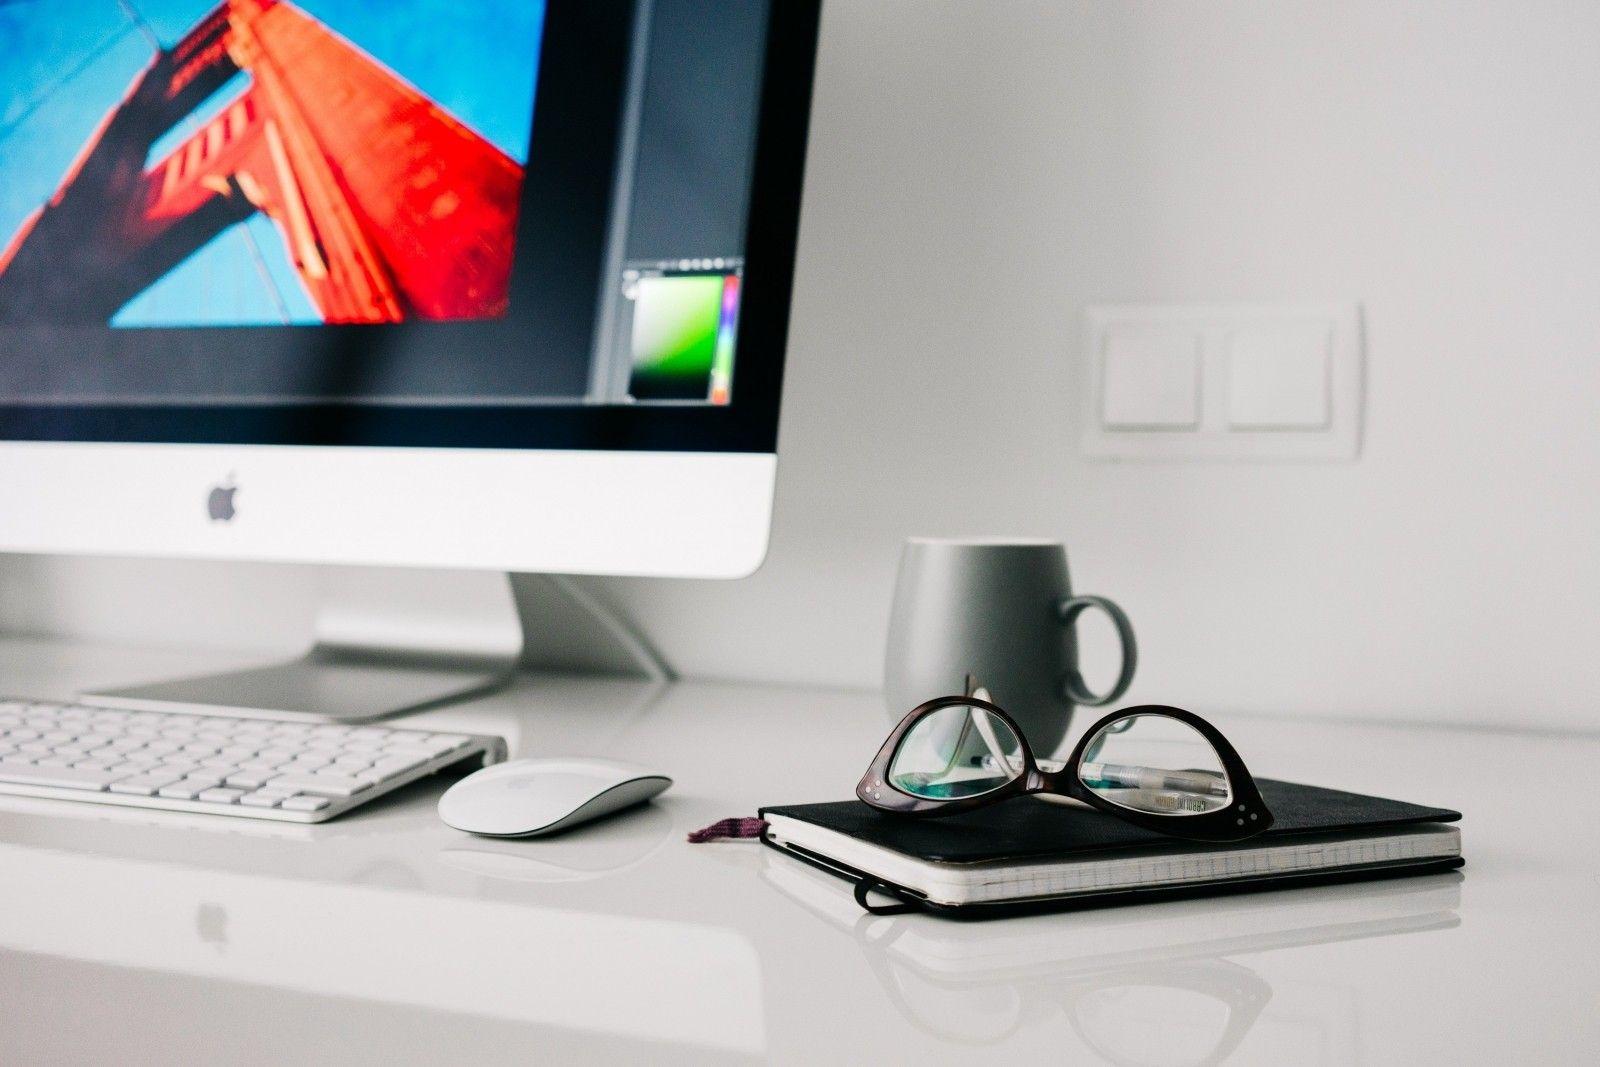 tarifas convergentes con fibra para tu ordenador